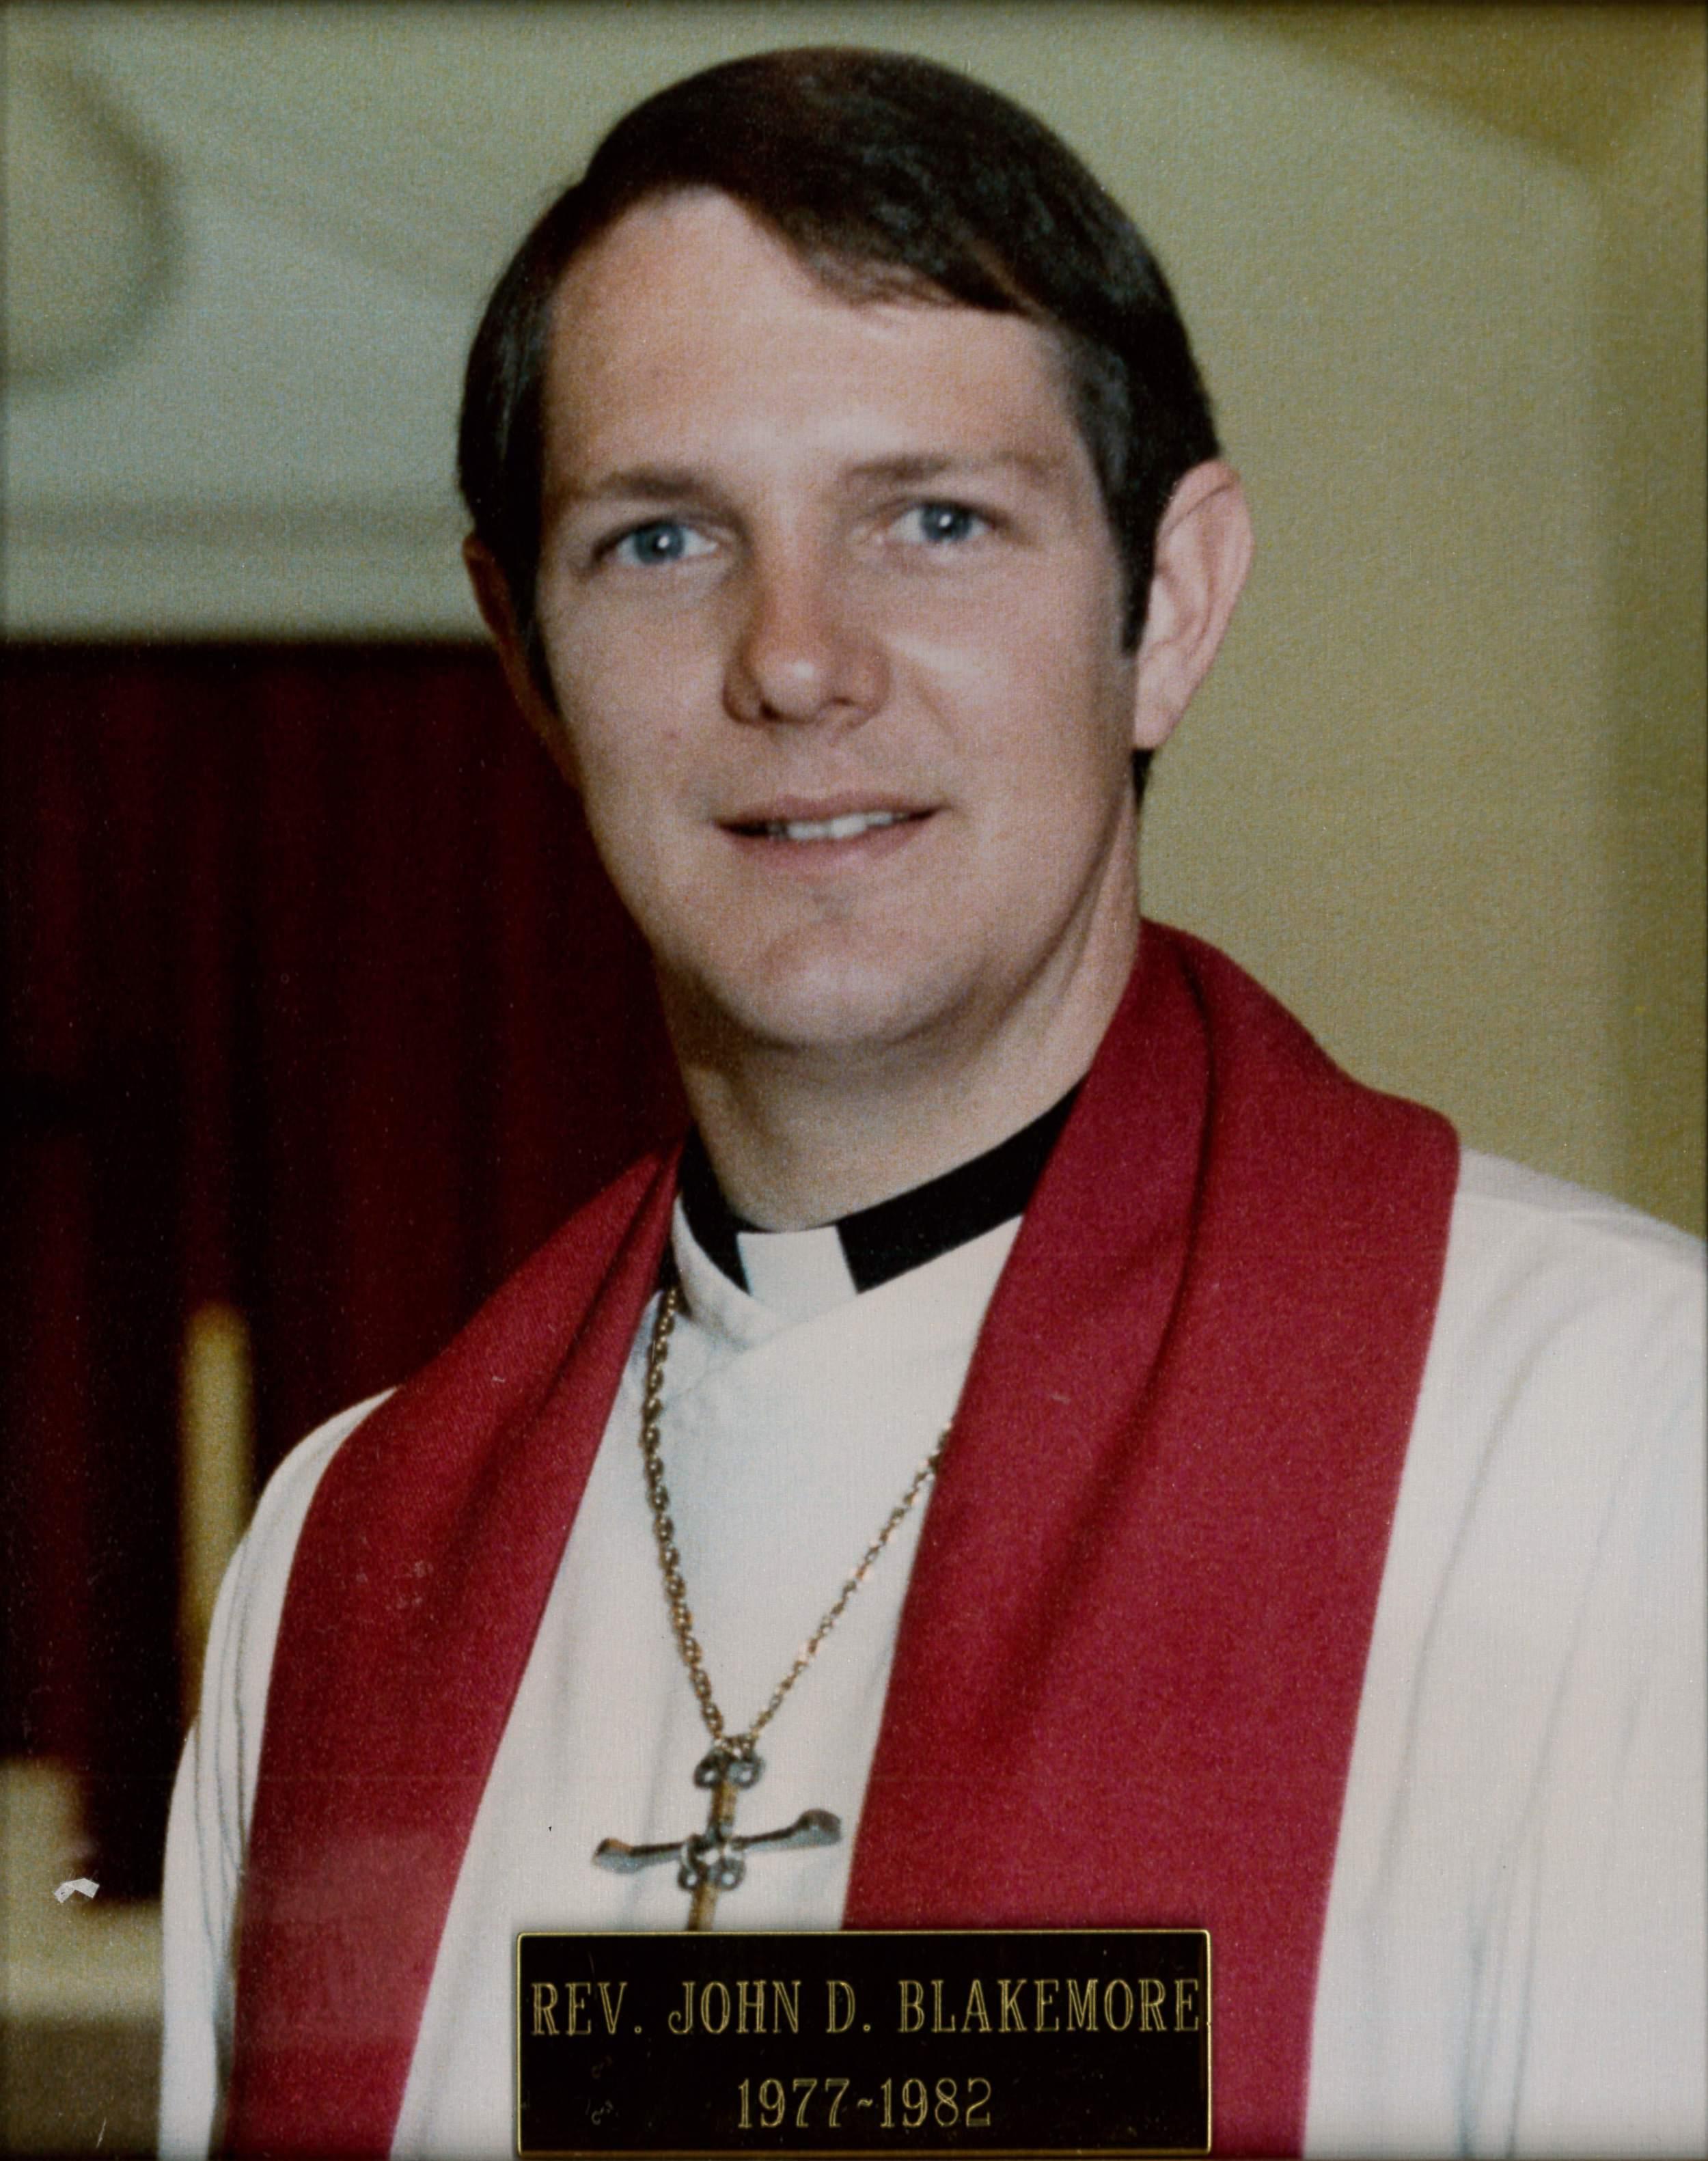 Rev. John Blakemore